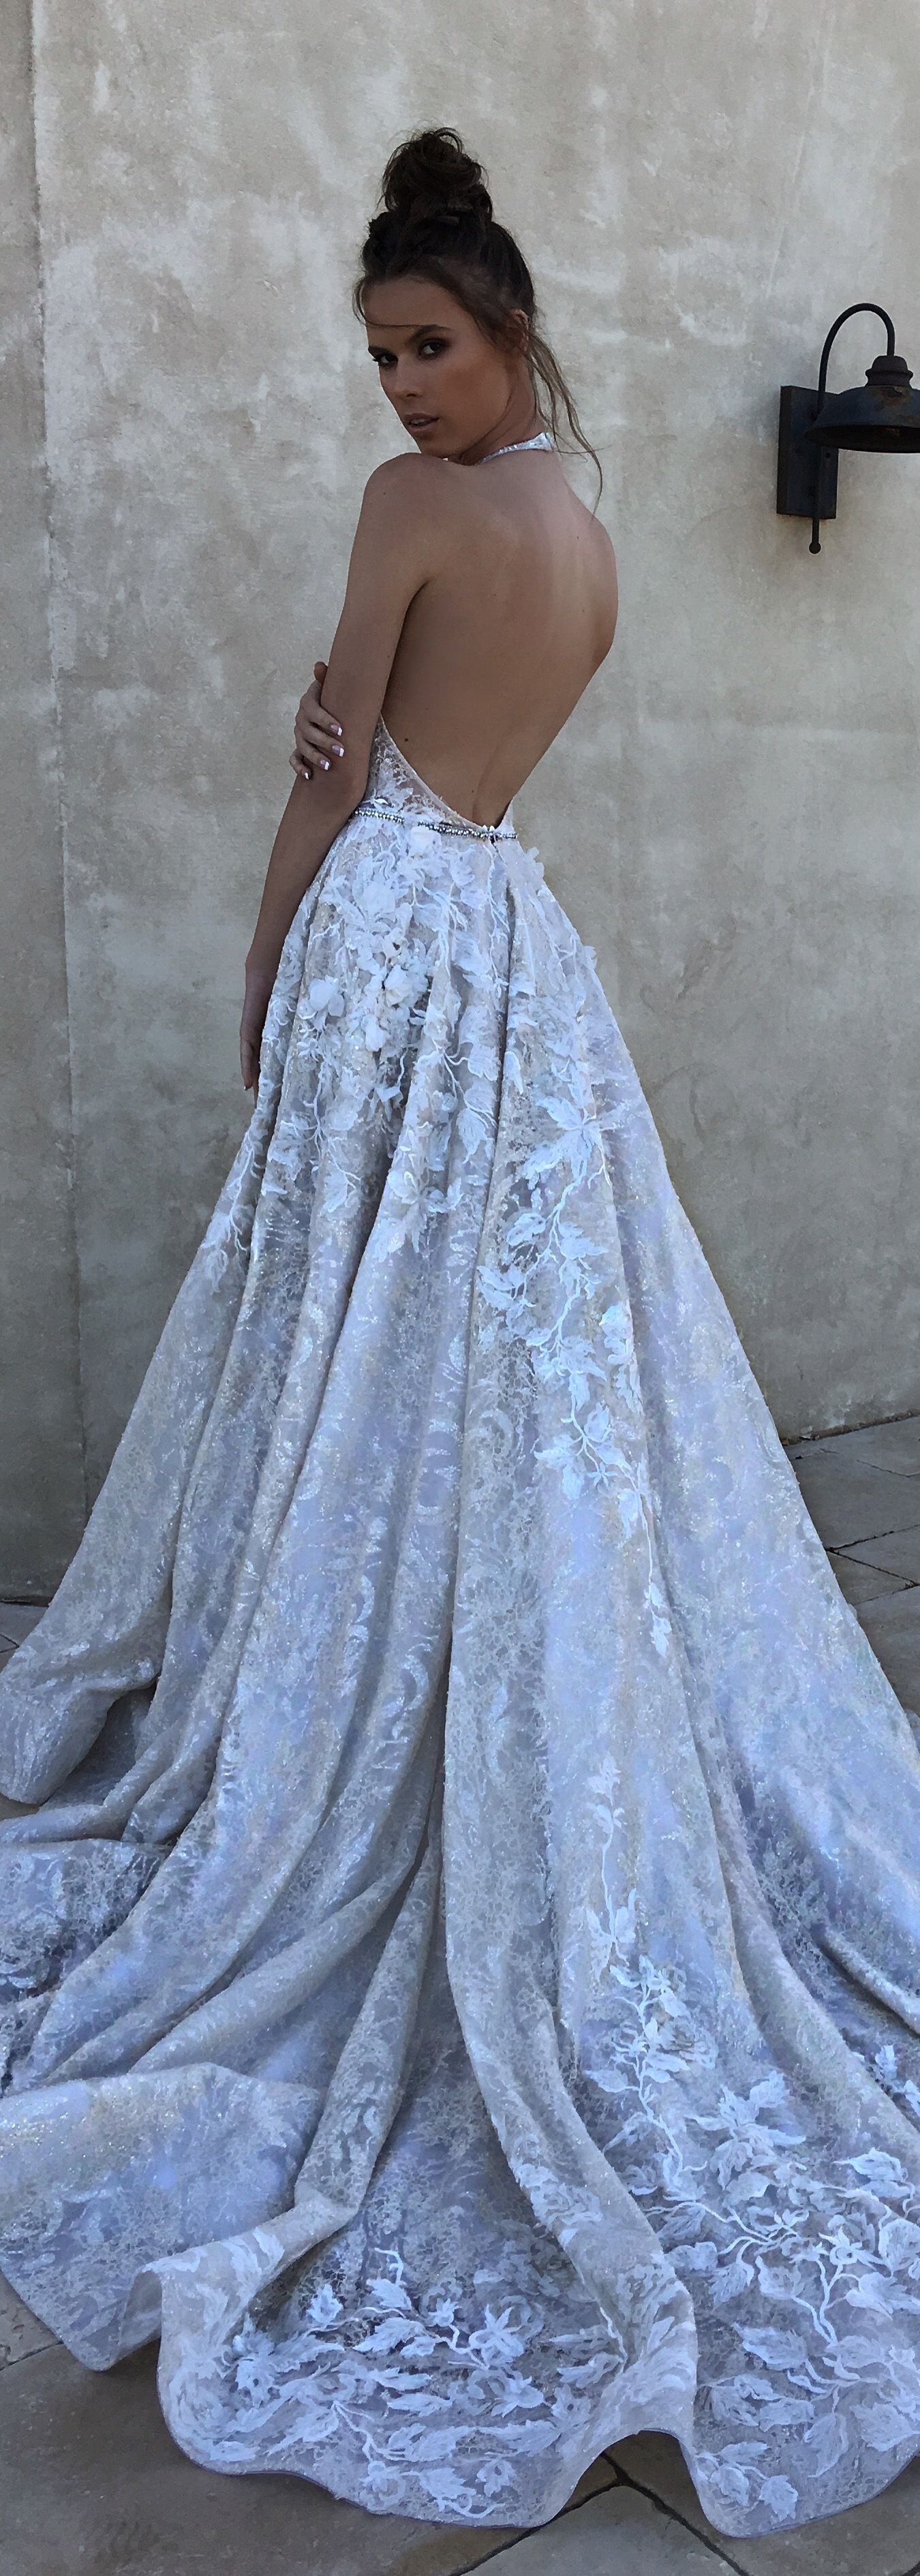 Ballgown Wedding Dress by Berta Bridal   @bertabridal   Creative ...